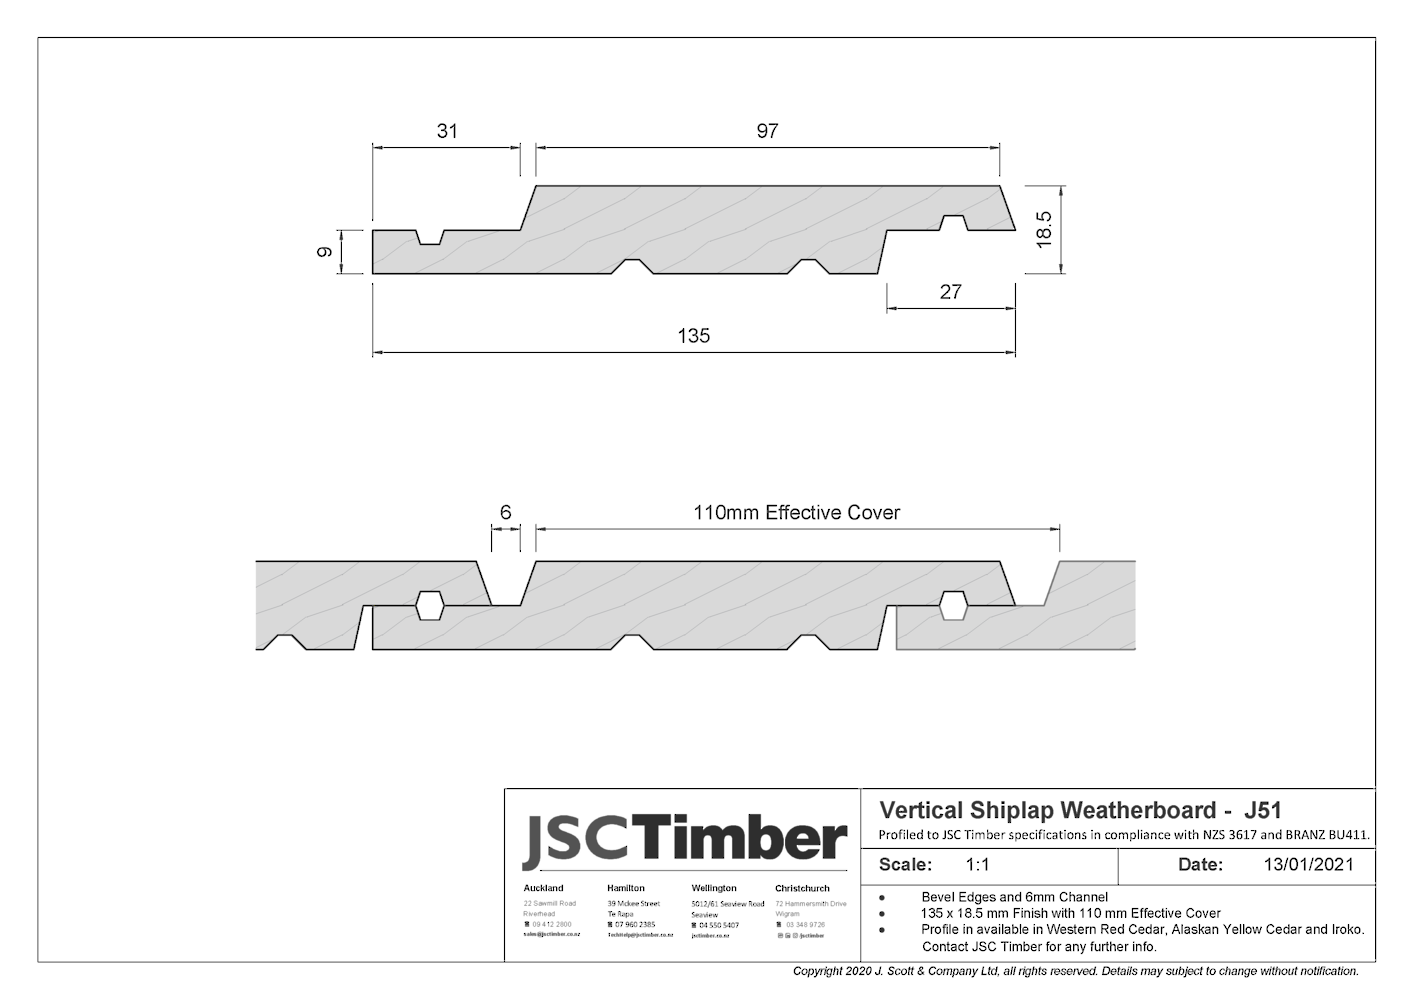 J51 Vertical Shiplap Weatherboard